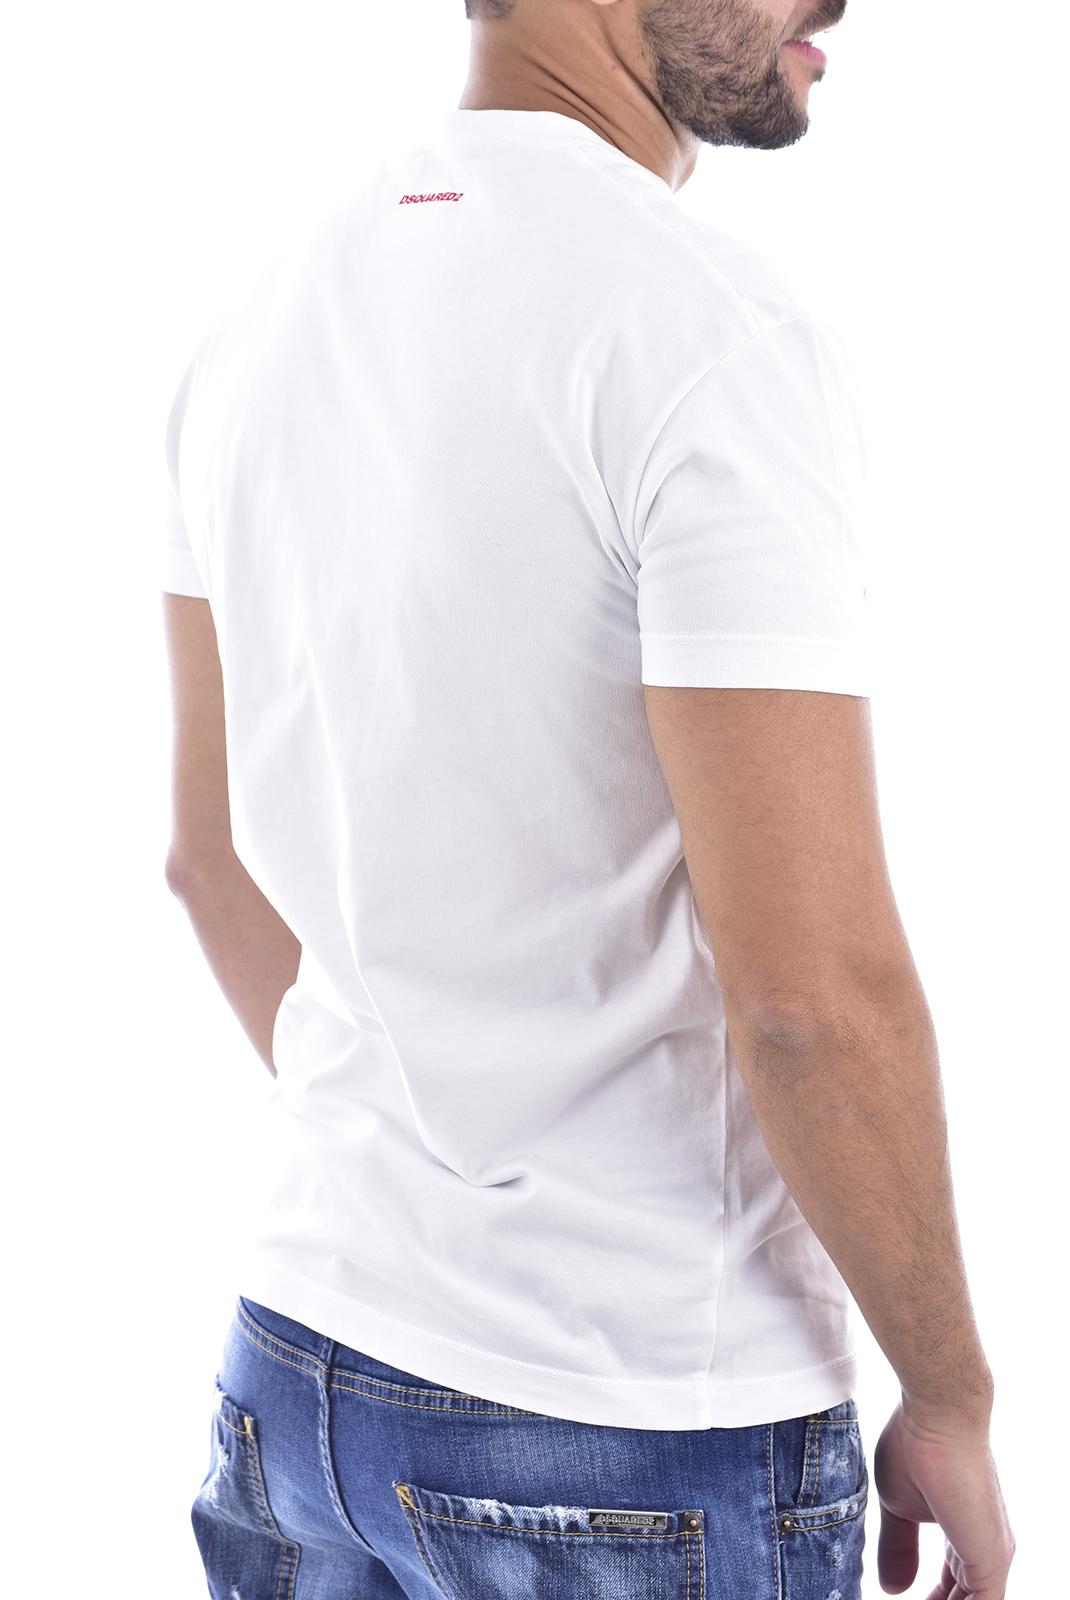 T-S manches courtes  Dsquared2 S71GD0809 100 blanc